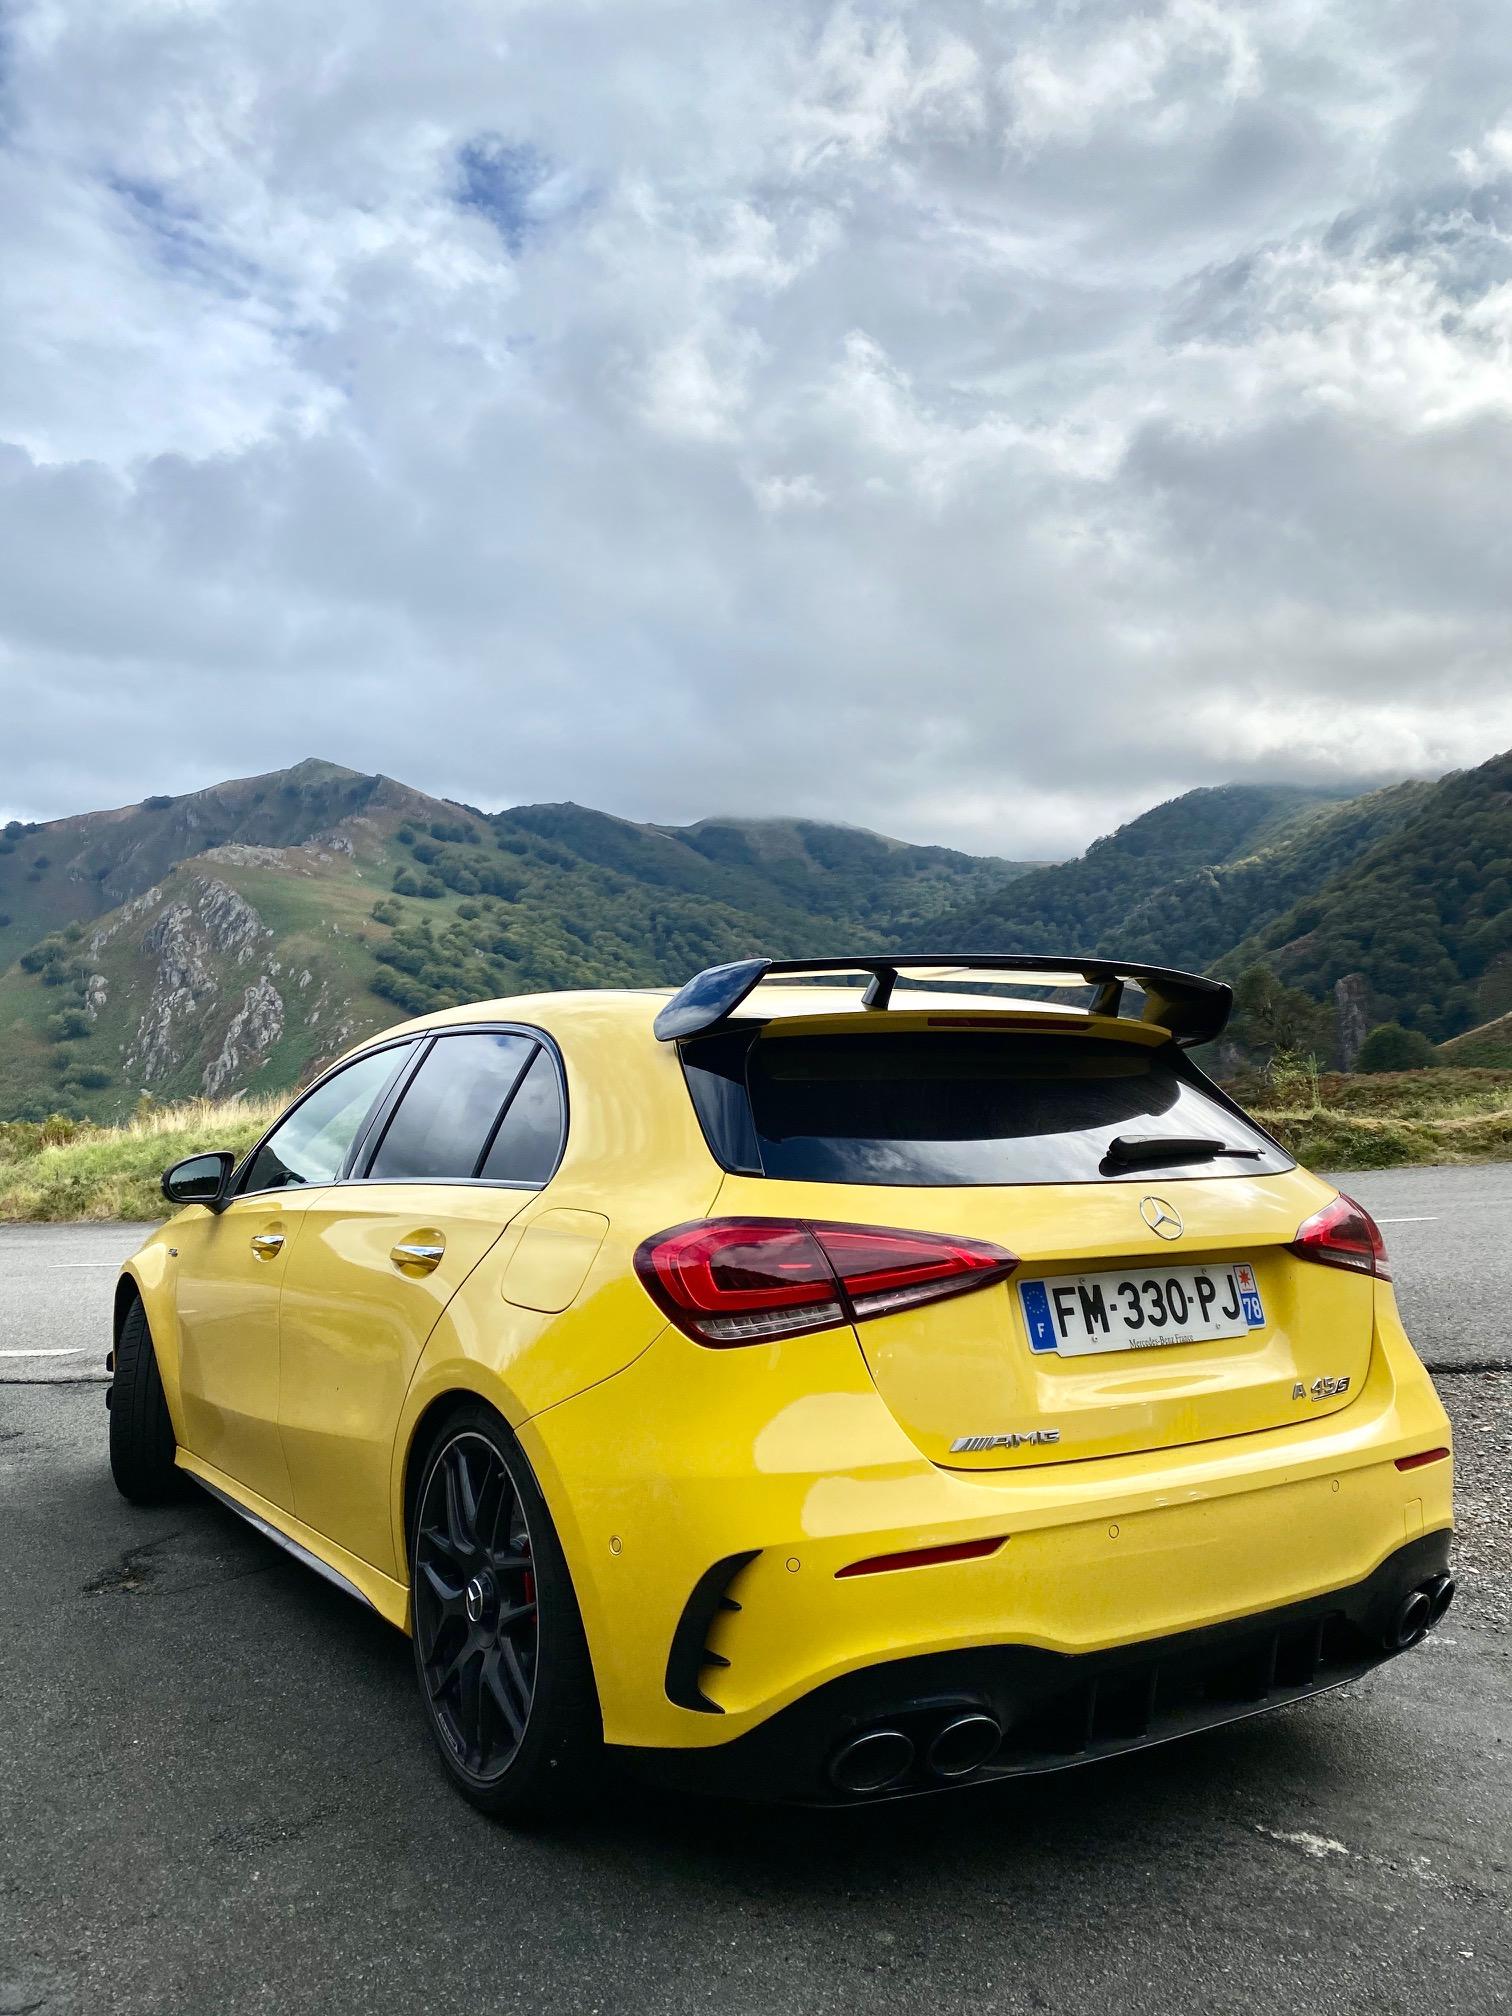 Mercedes, mercedes AMG, compacten compacte sportive, voiture sportive, mercedes A 45 S AMG